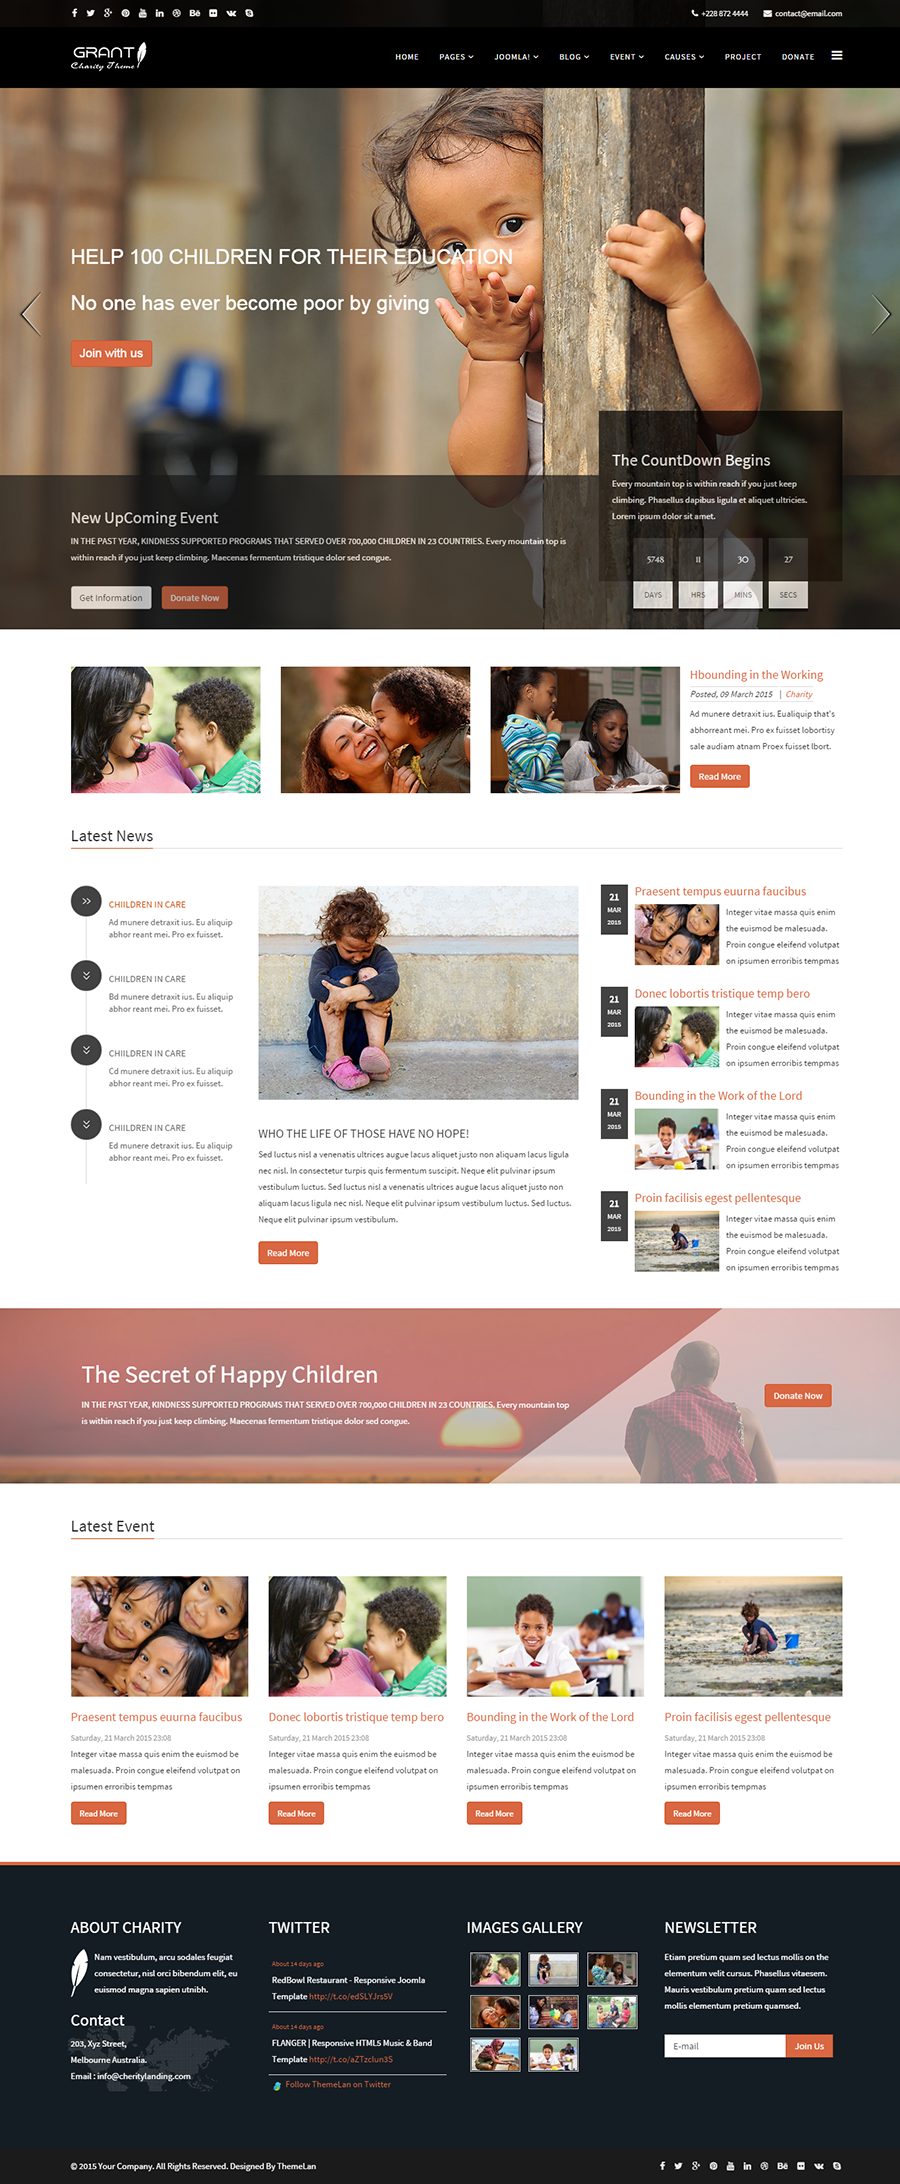 Grant Charity Nonprofit Ngo Html5 Template Web Development Design Website Design Joomla Templates